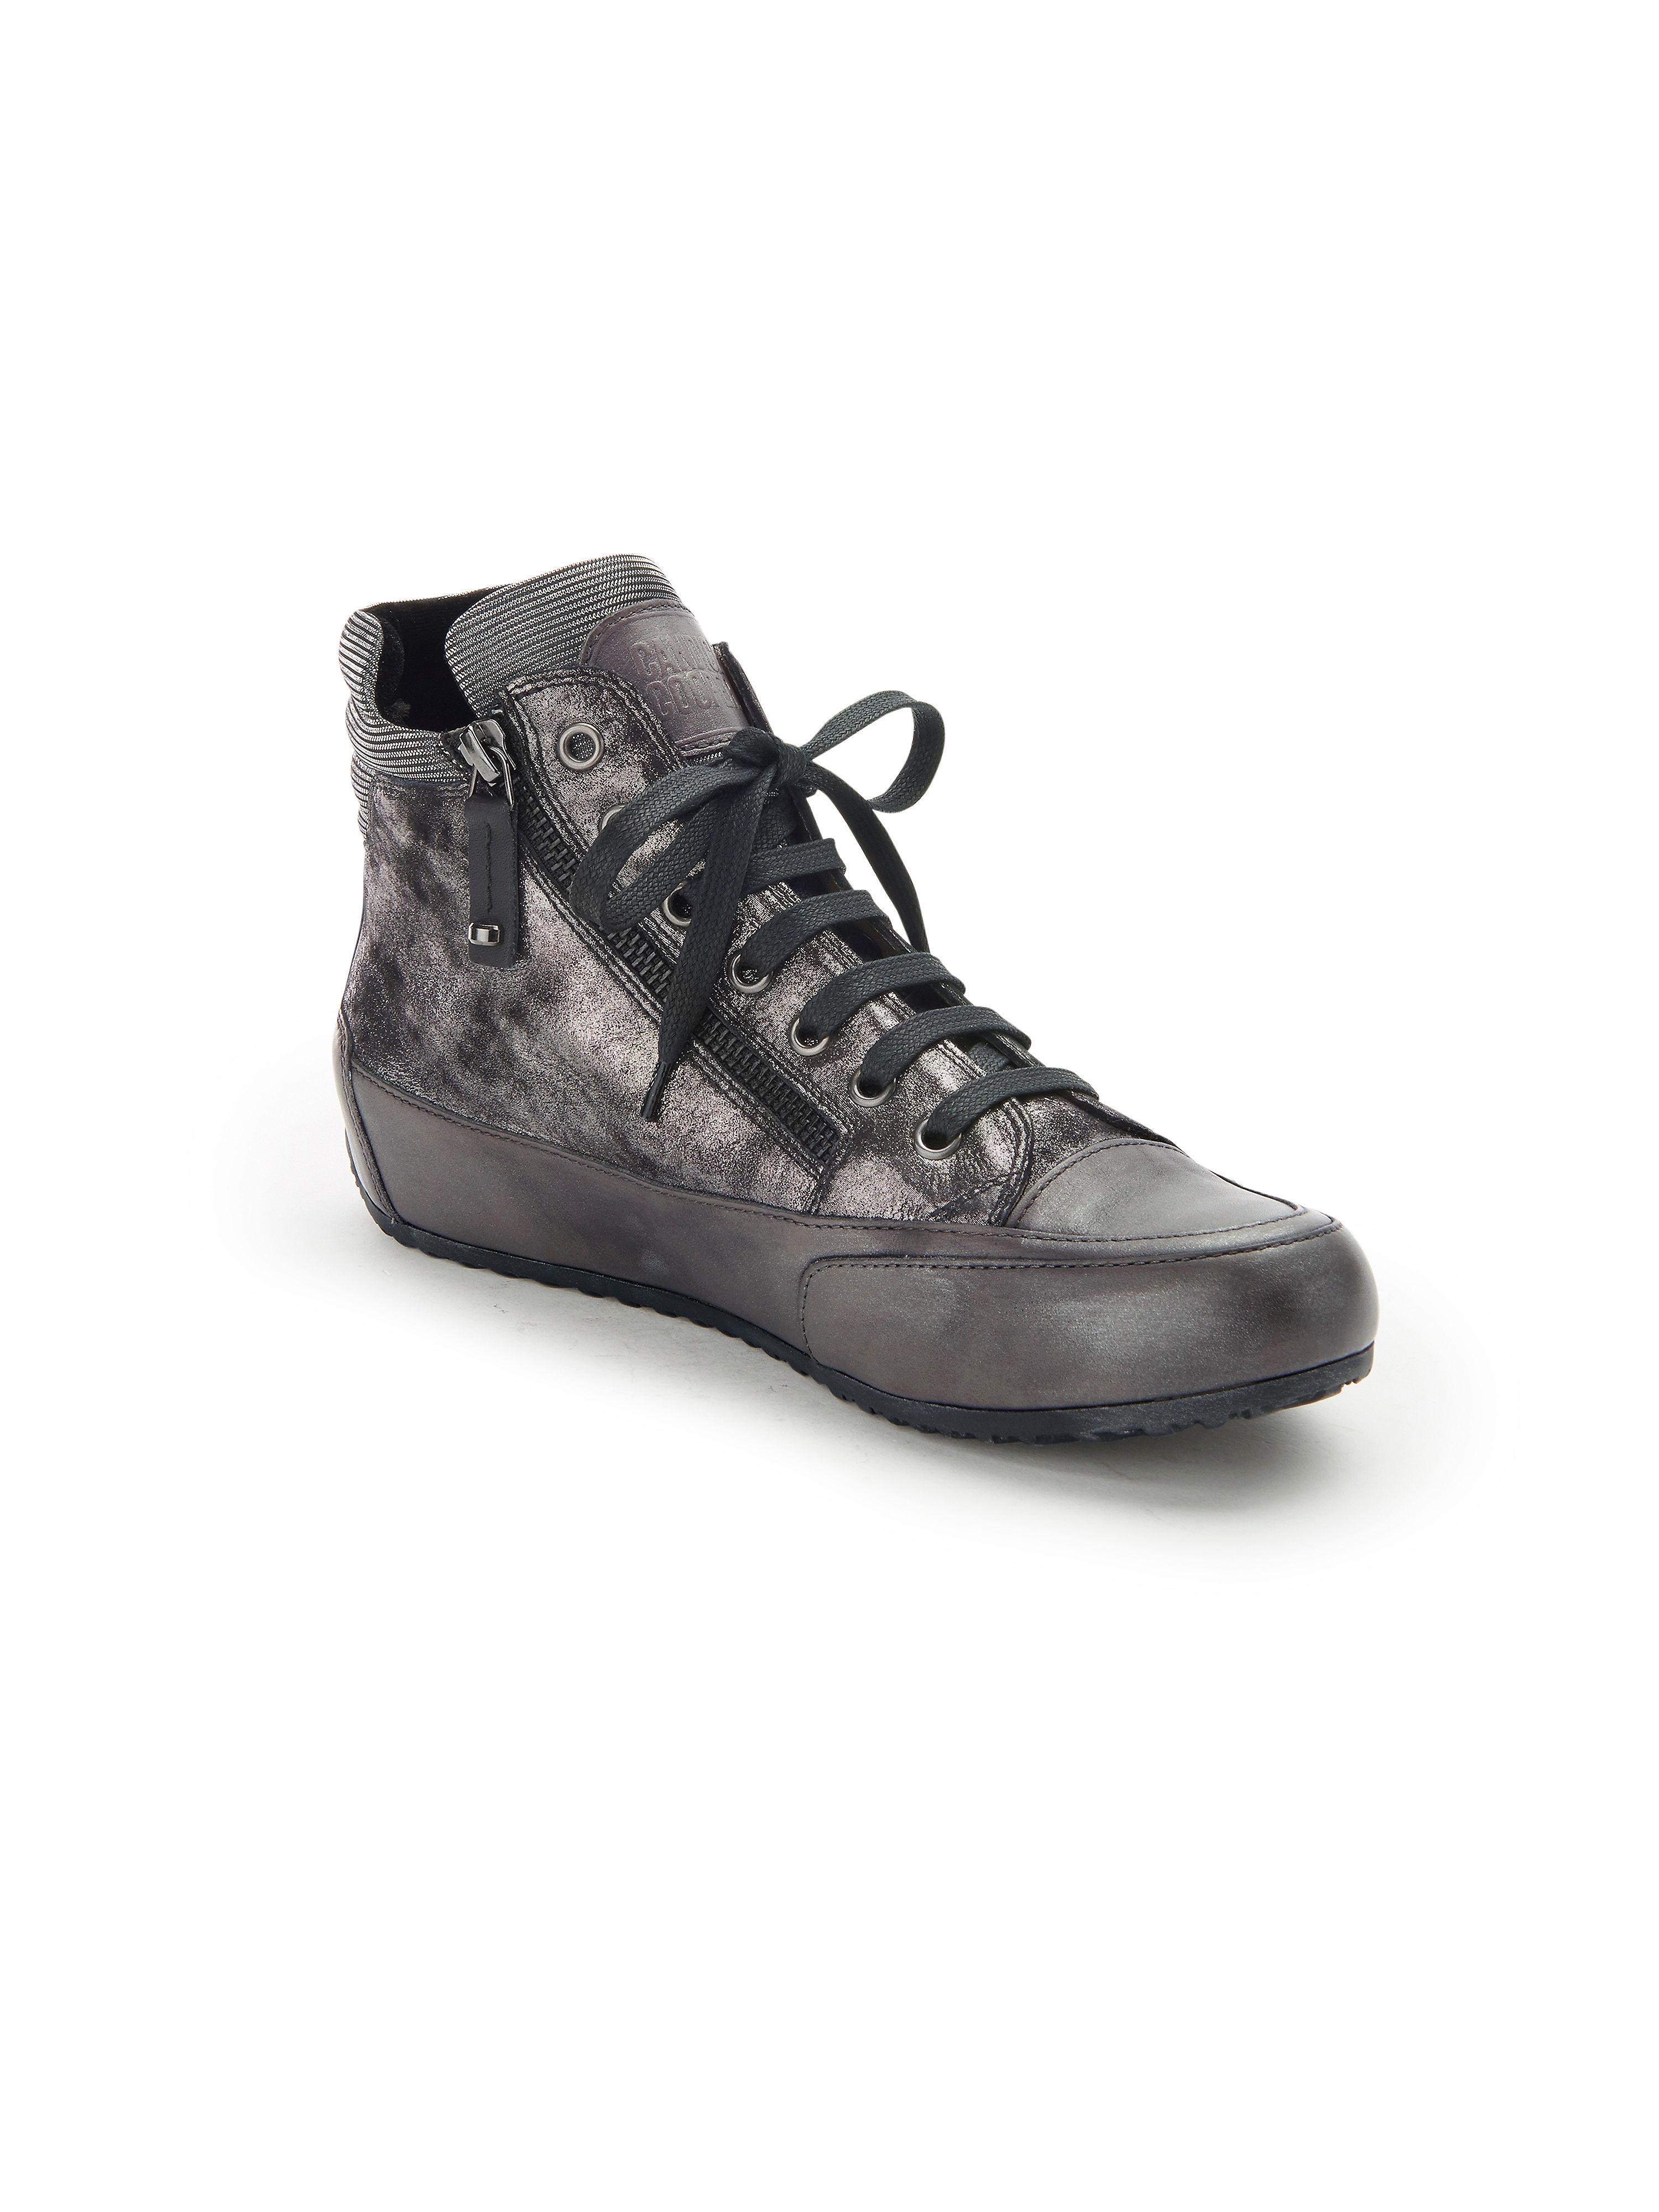 "Candice Cooper - Sneaker ""Lion Zip"" - Schwarz-Metallic Gute Qualität beliebte Schuhe"